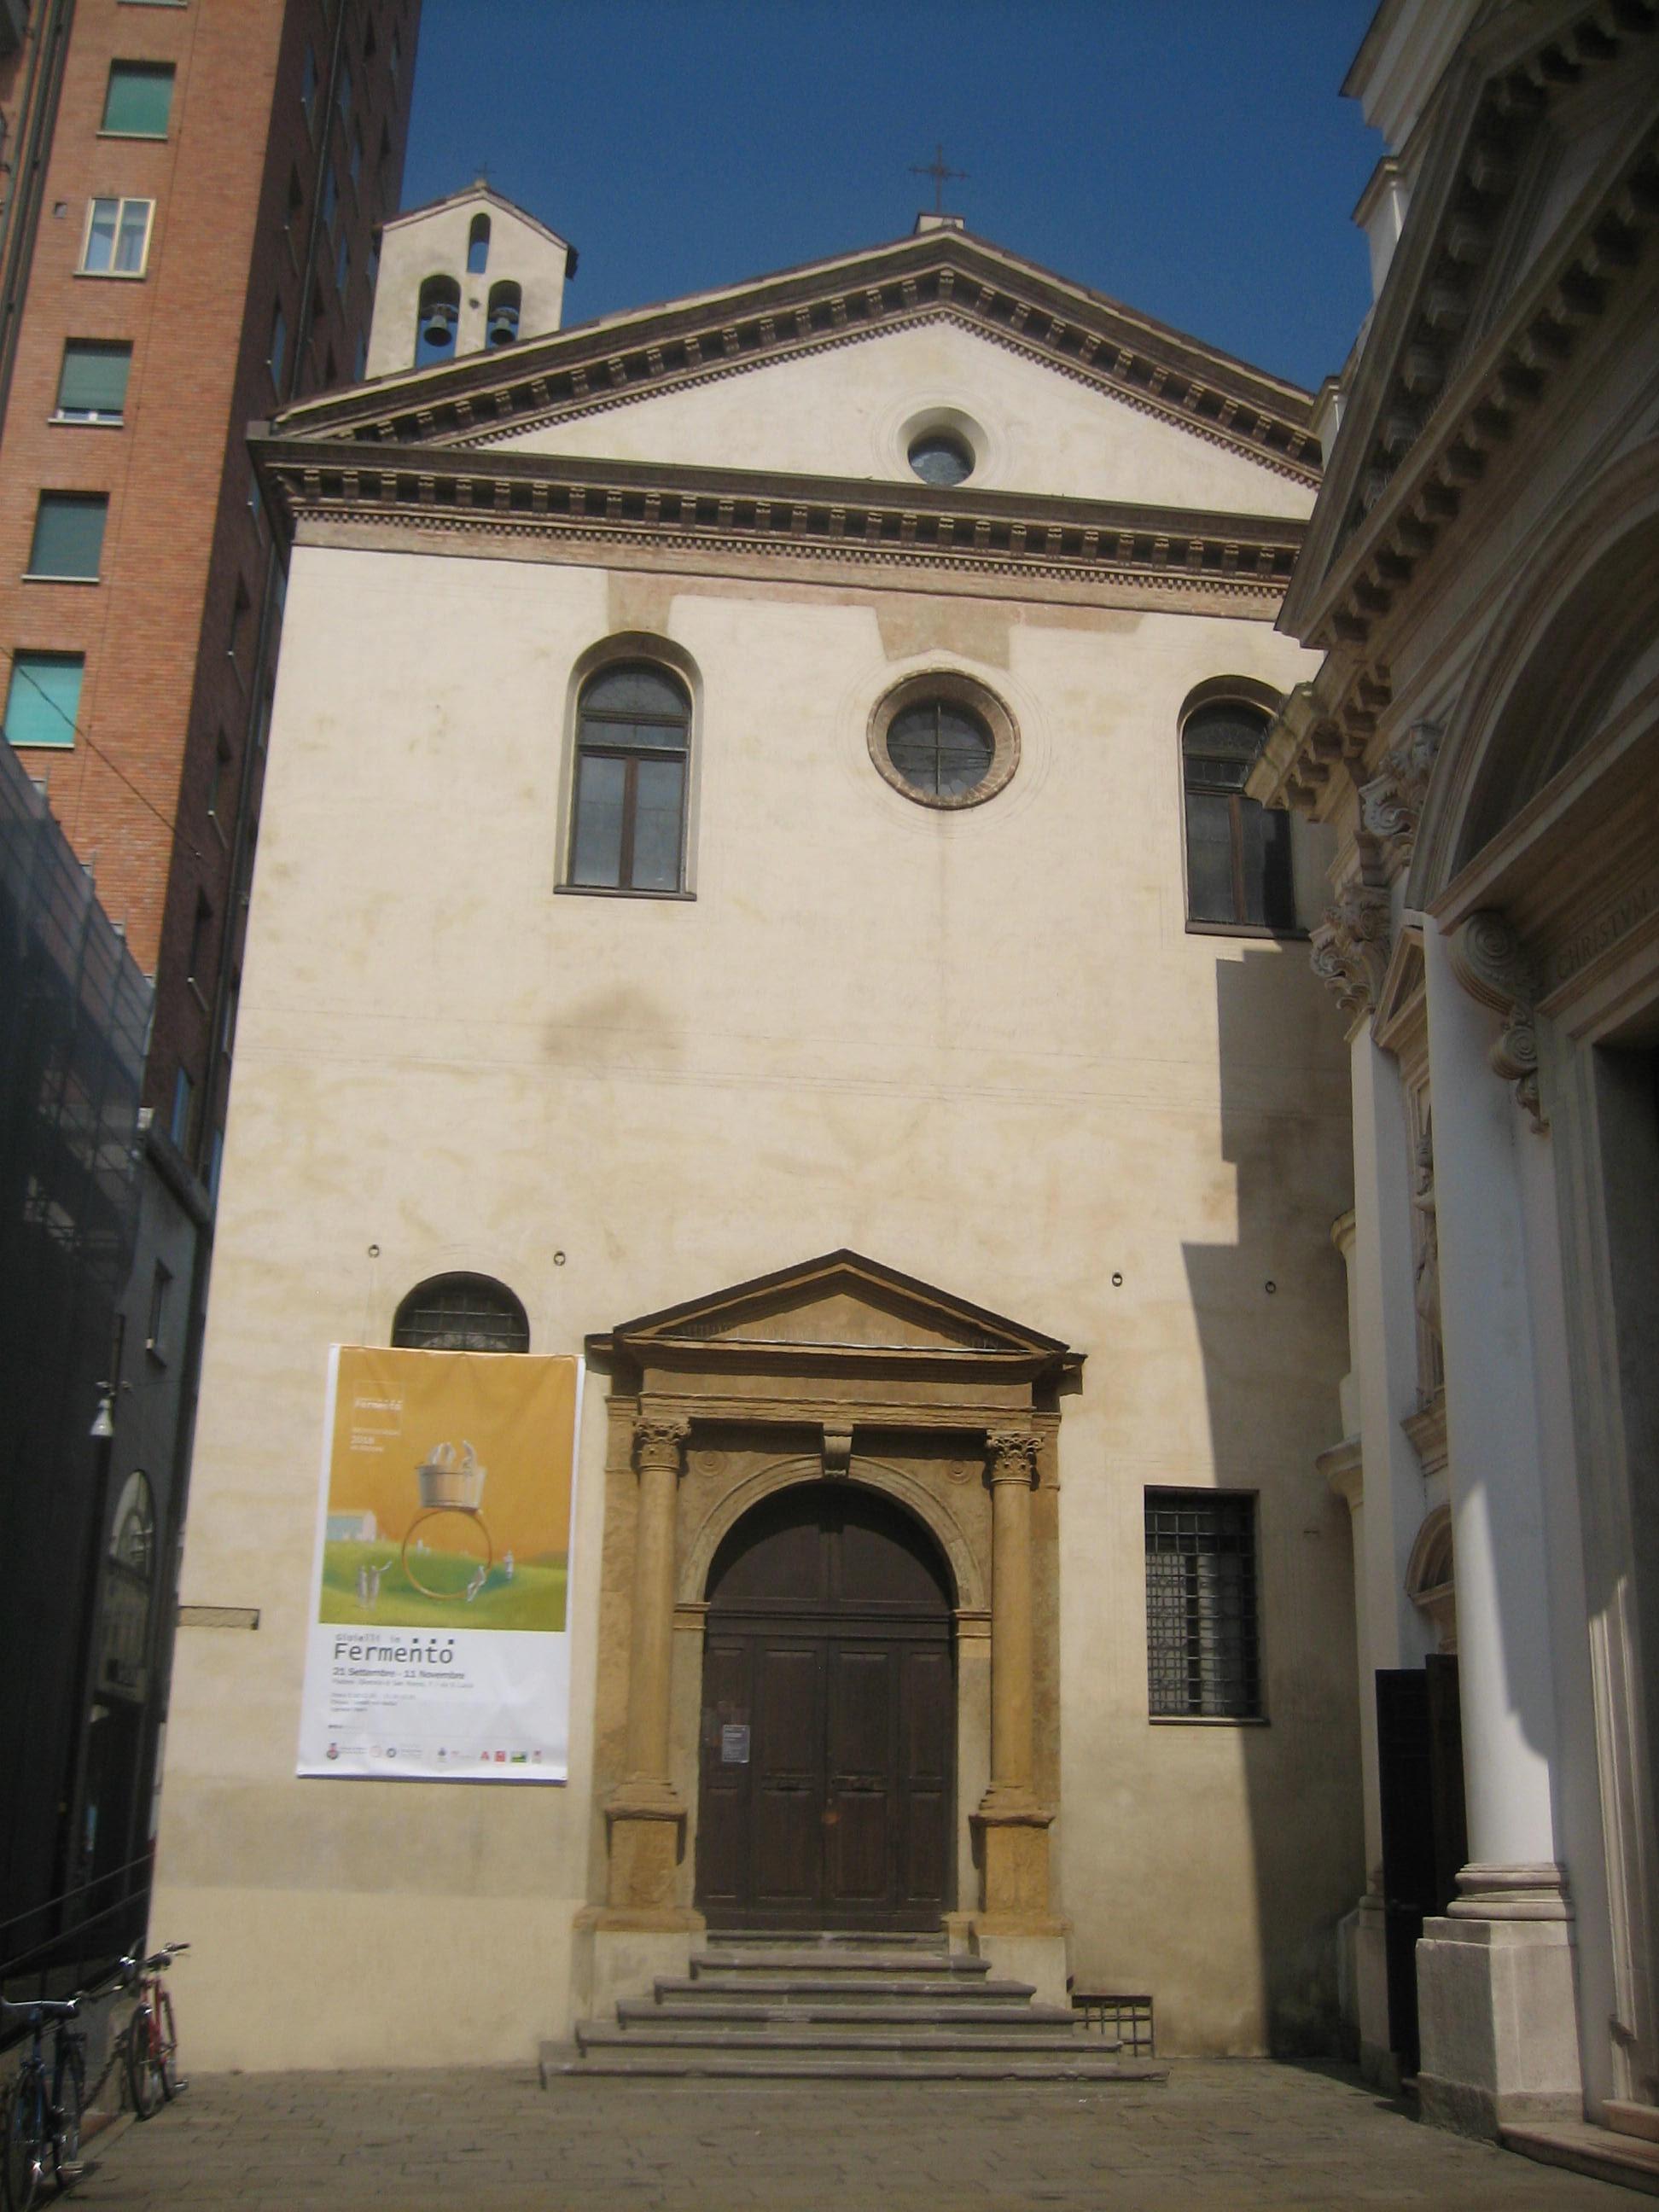 Oratorio di San Rocco, Padua. Foto Esther Doornbusch, september 2018©